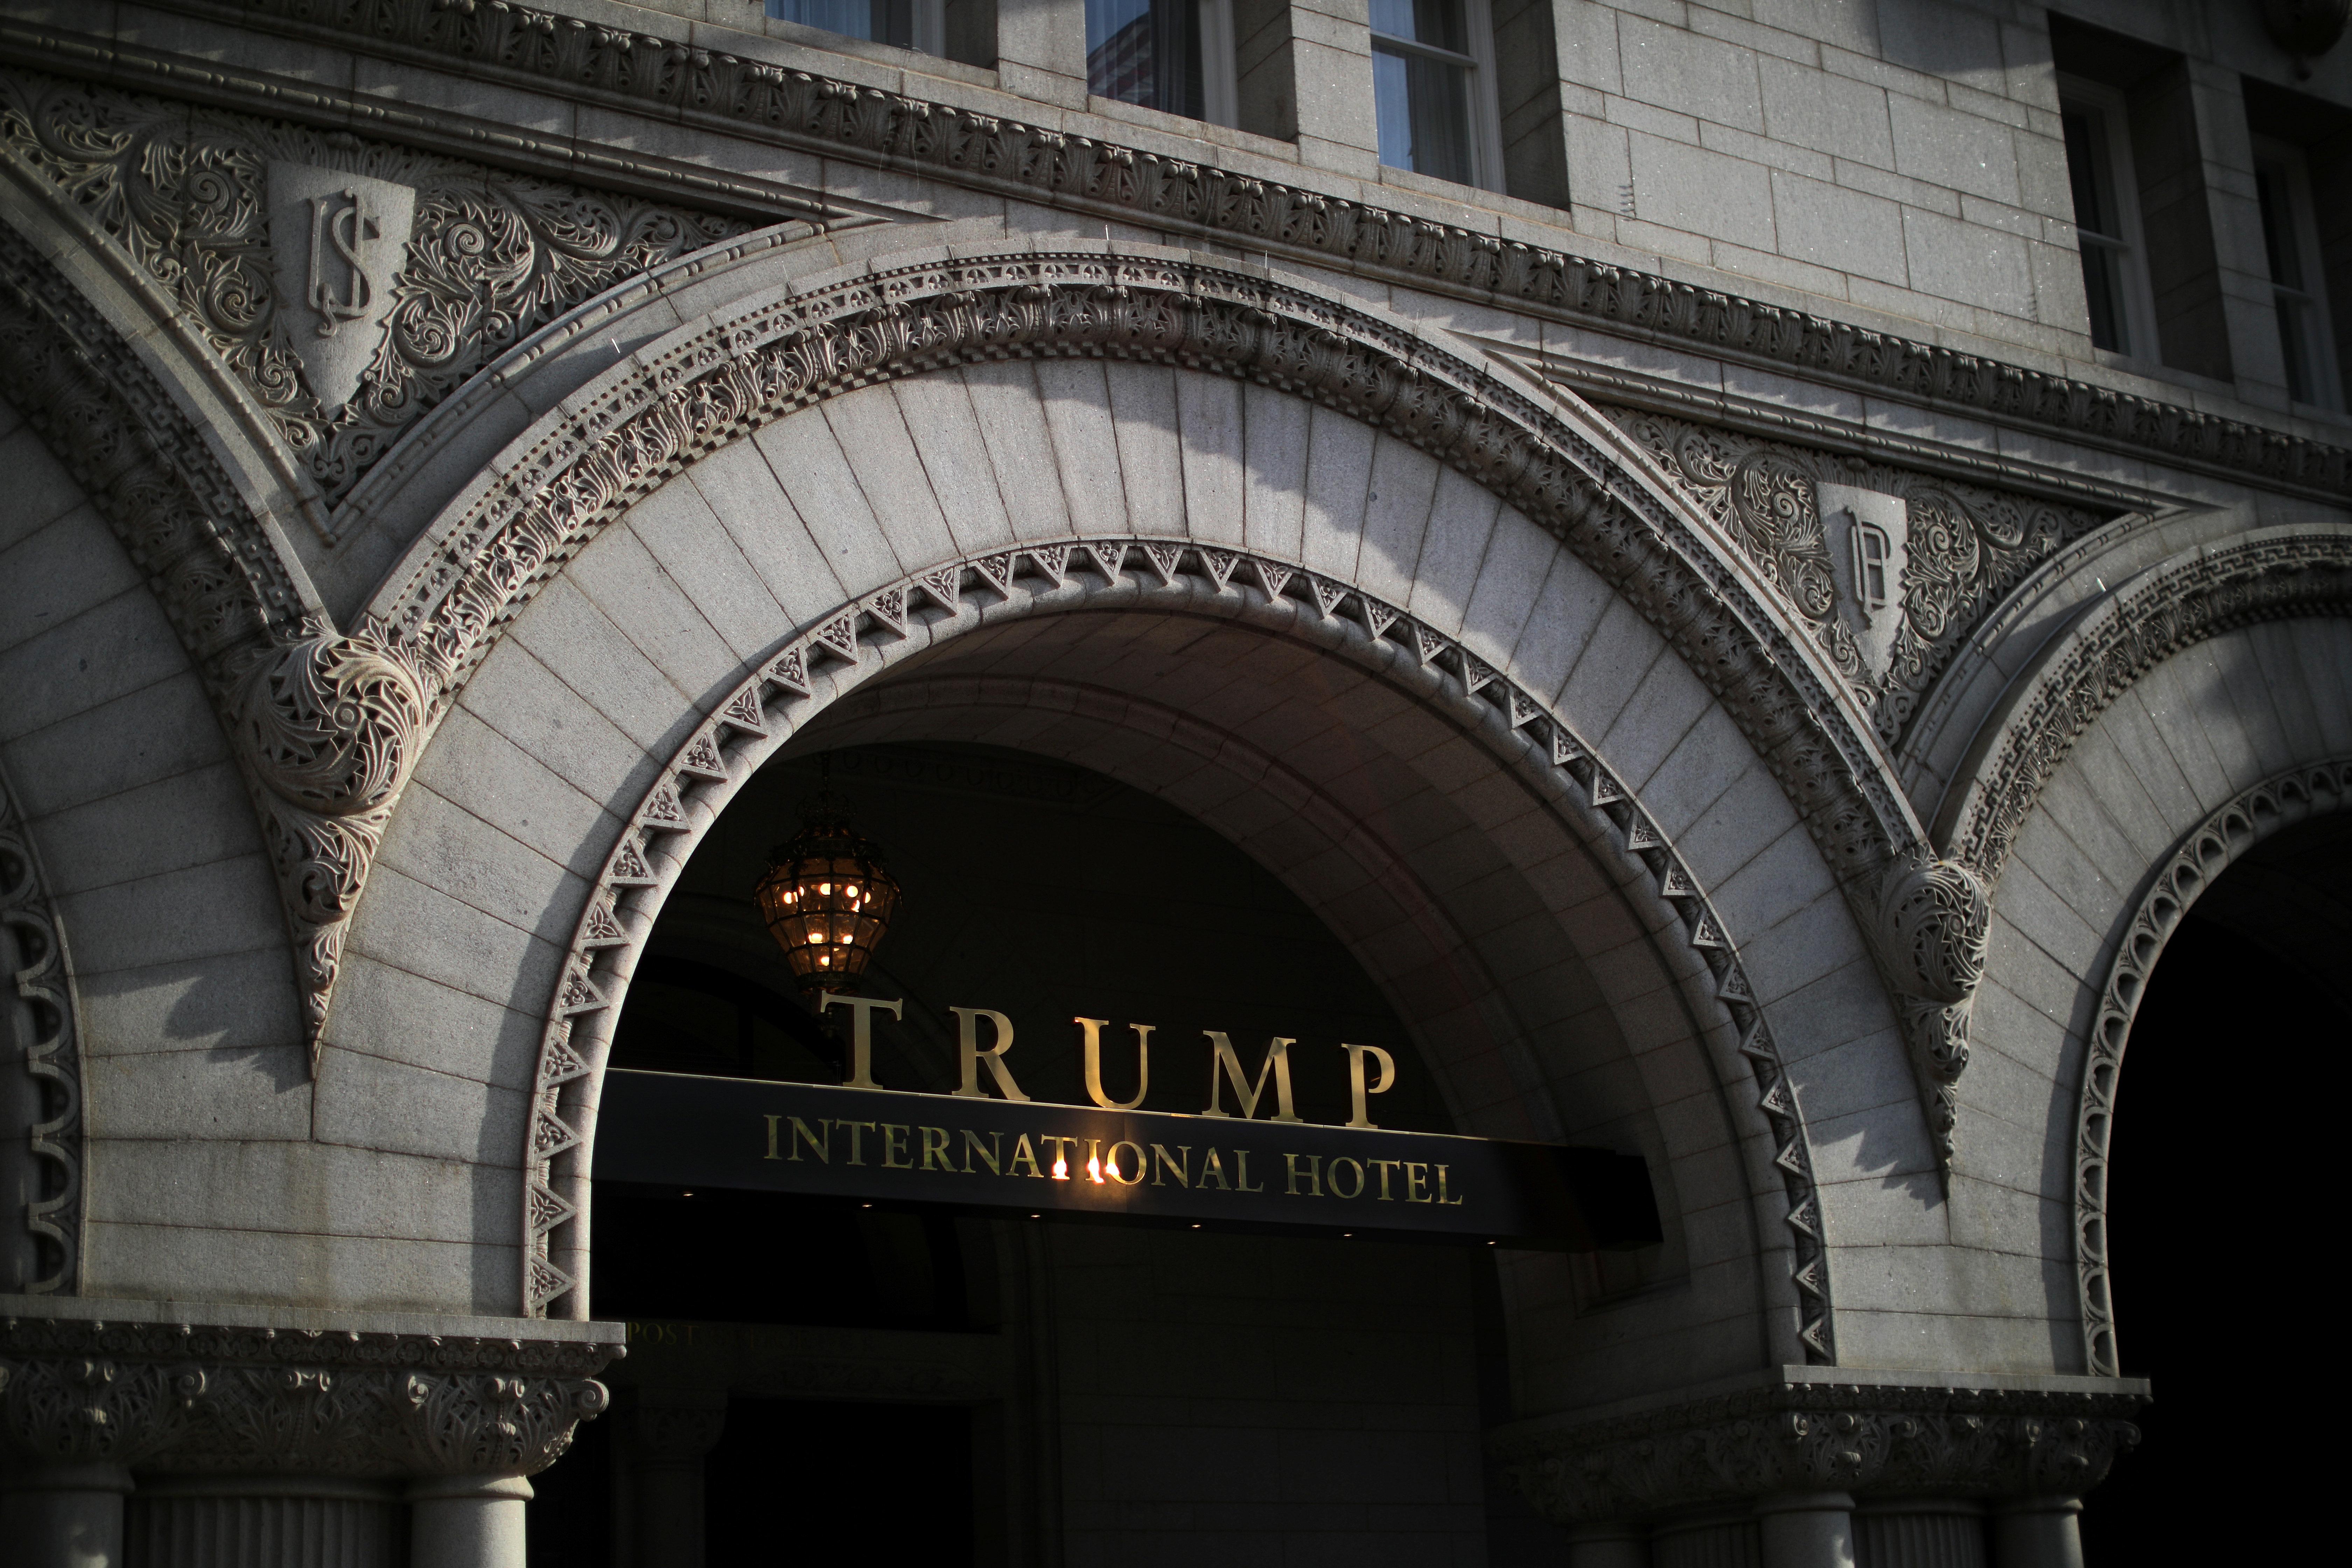 The entrance of Trump International Hotel is seen in downtown Washington, U.S., June 28, 2017. REUTERS/Carlos Barria